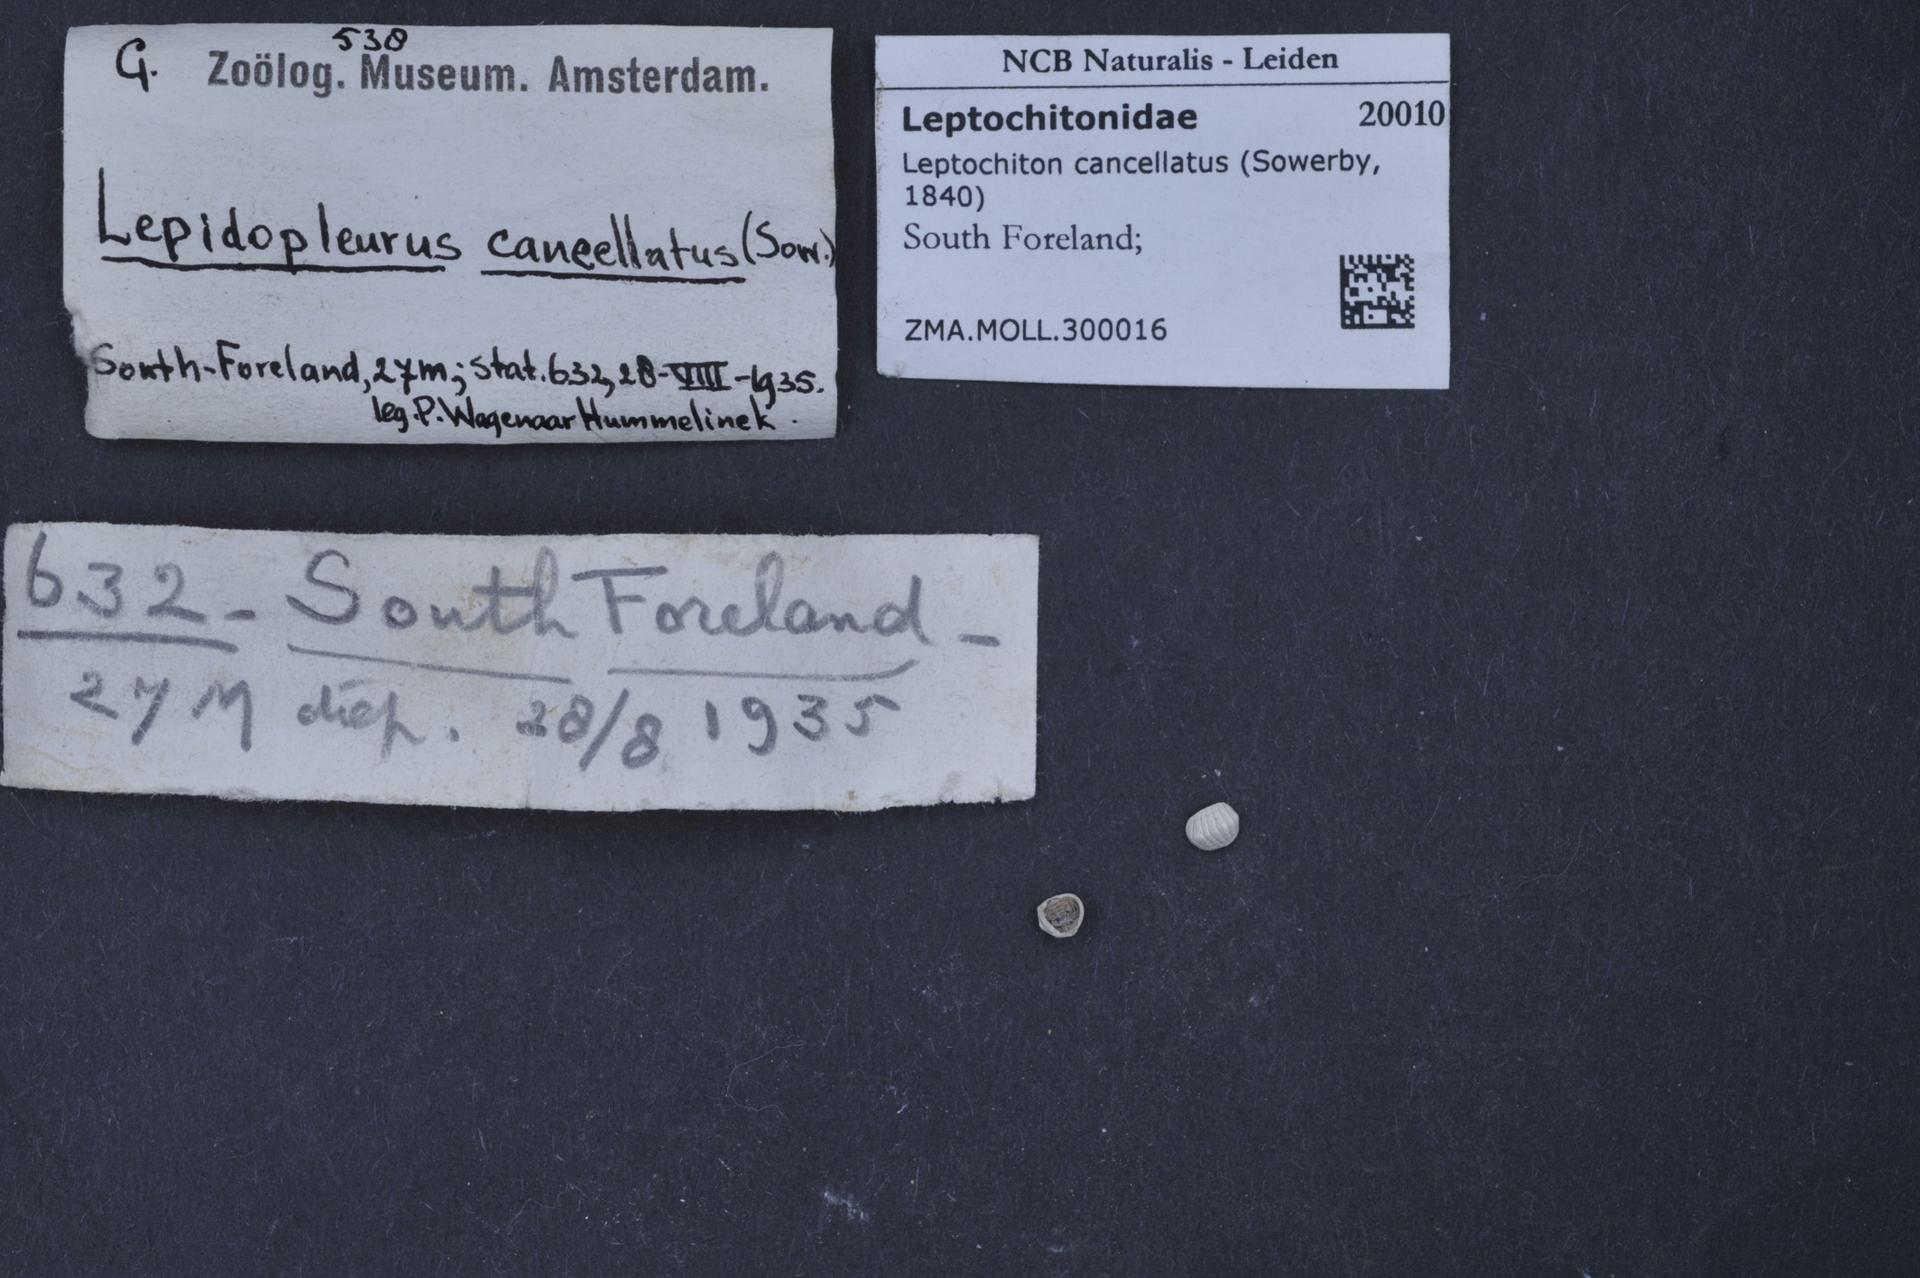 ZMA.MOLL.300016 | Leptochiton cancellatus Sowerby, 1840